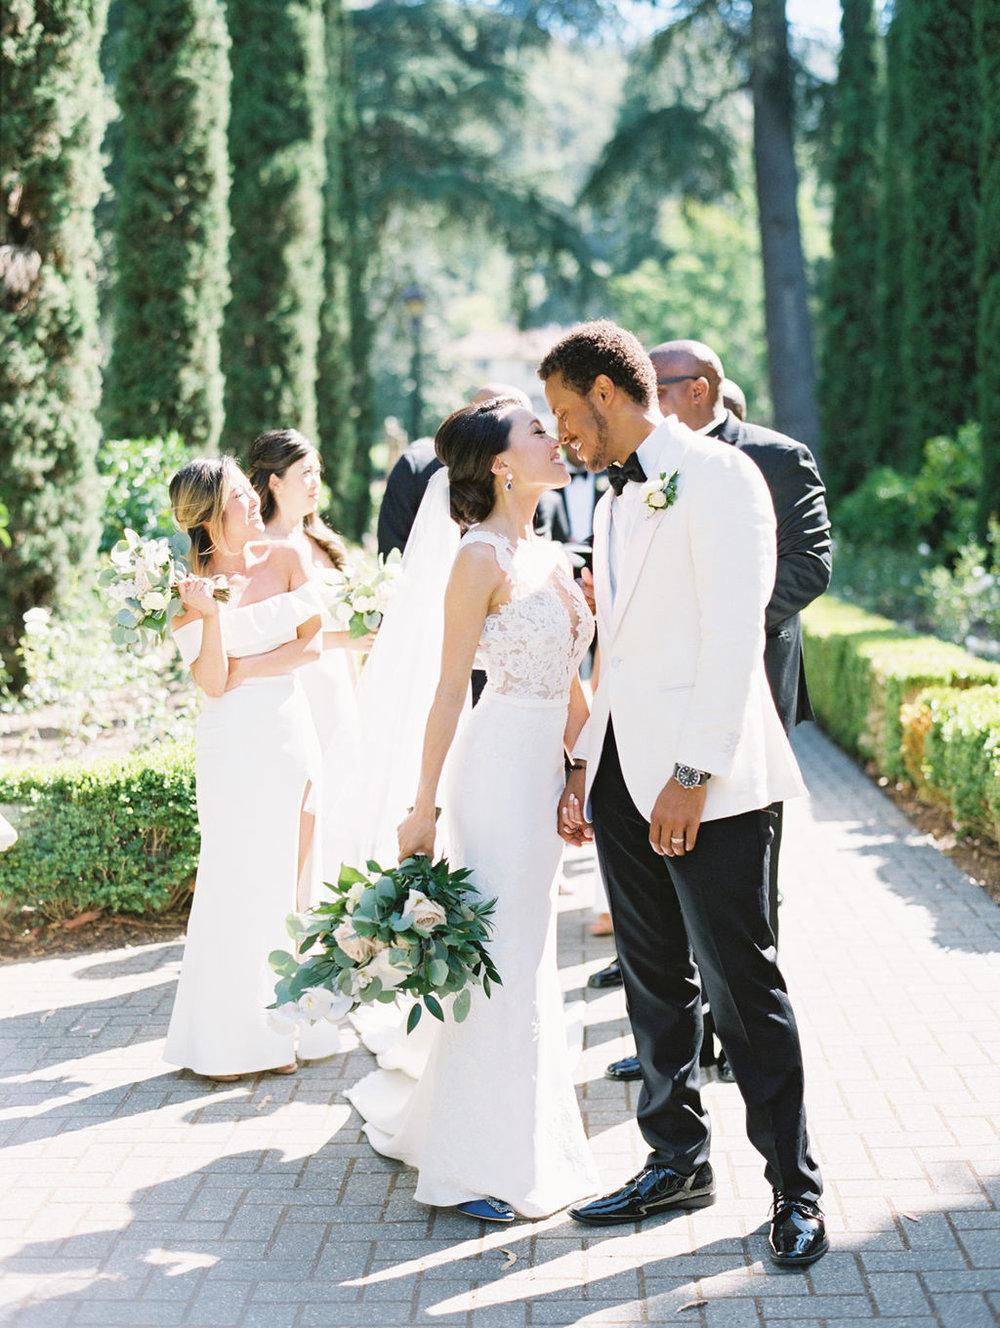 JennySoiPhotography-DCBridalParty-163.jpgFilm Destination Wedding California Fine Art Photographer Jenny Soi - All White Wedding at Villa Montalvo Saratoga, CA